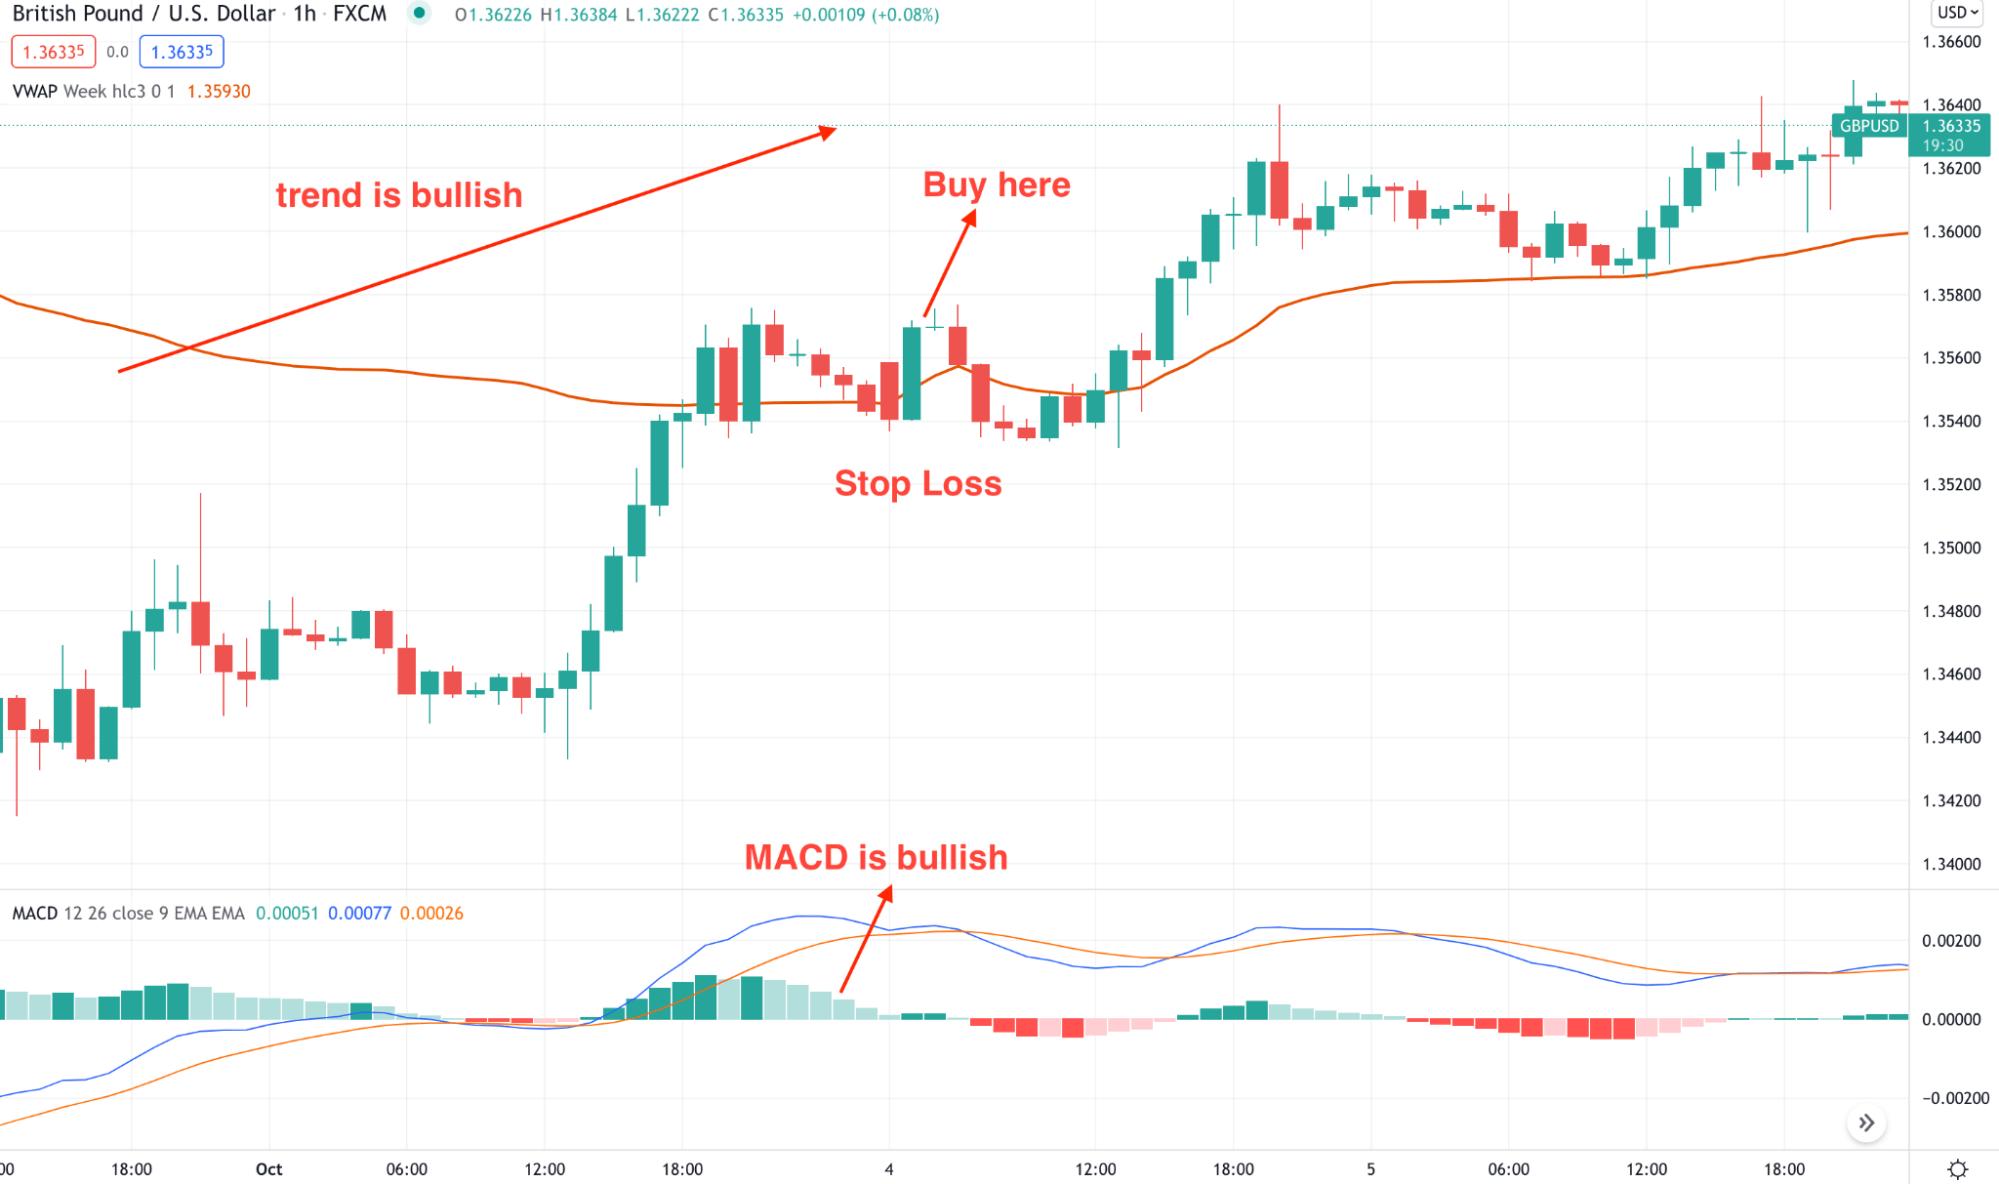 Long-term trading